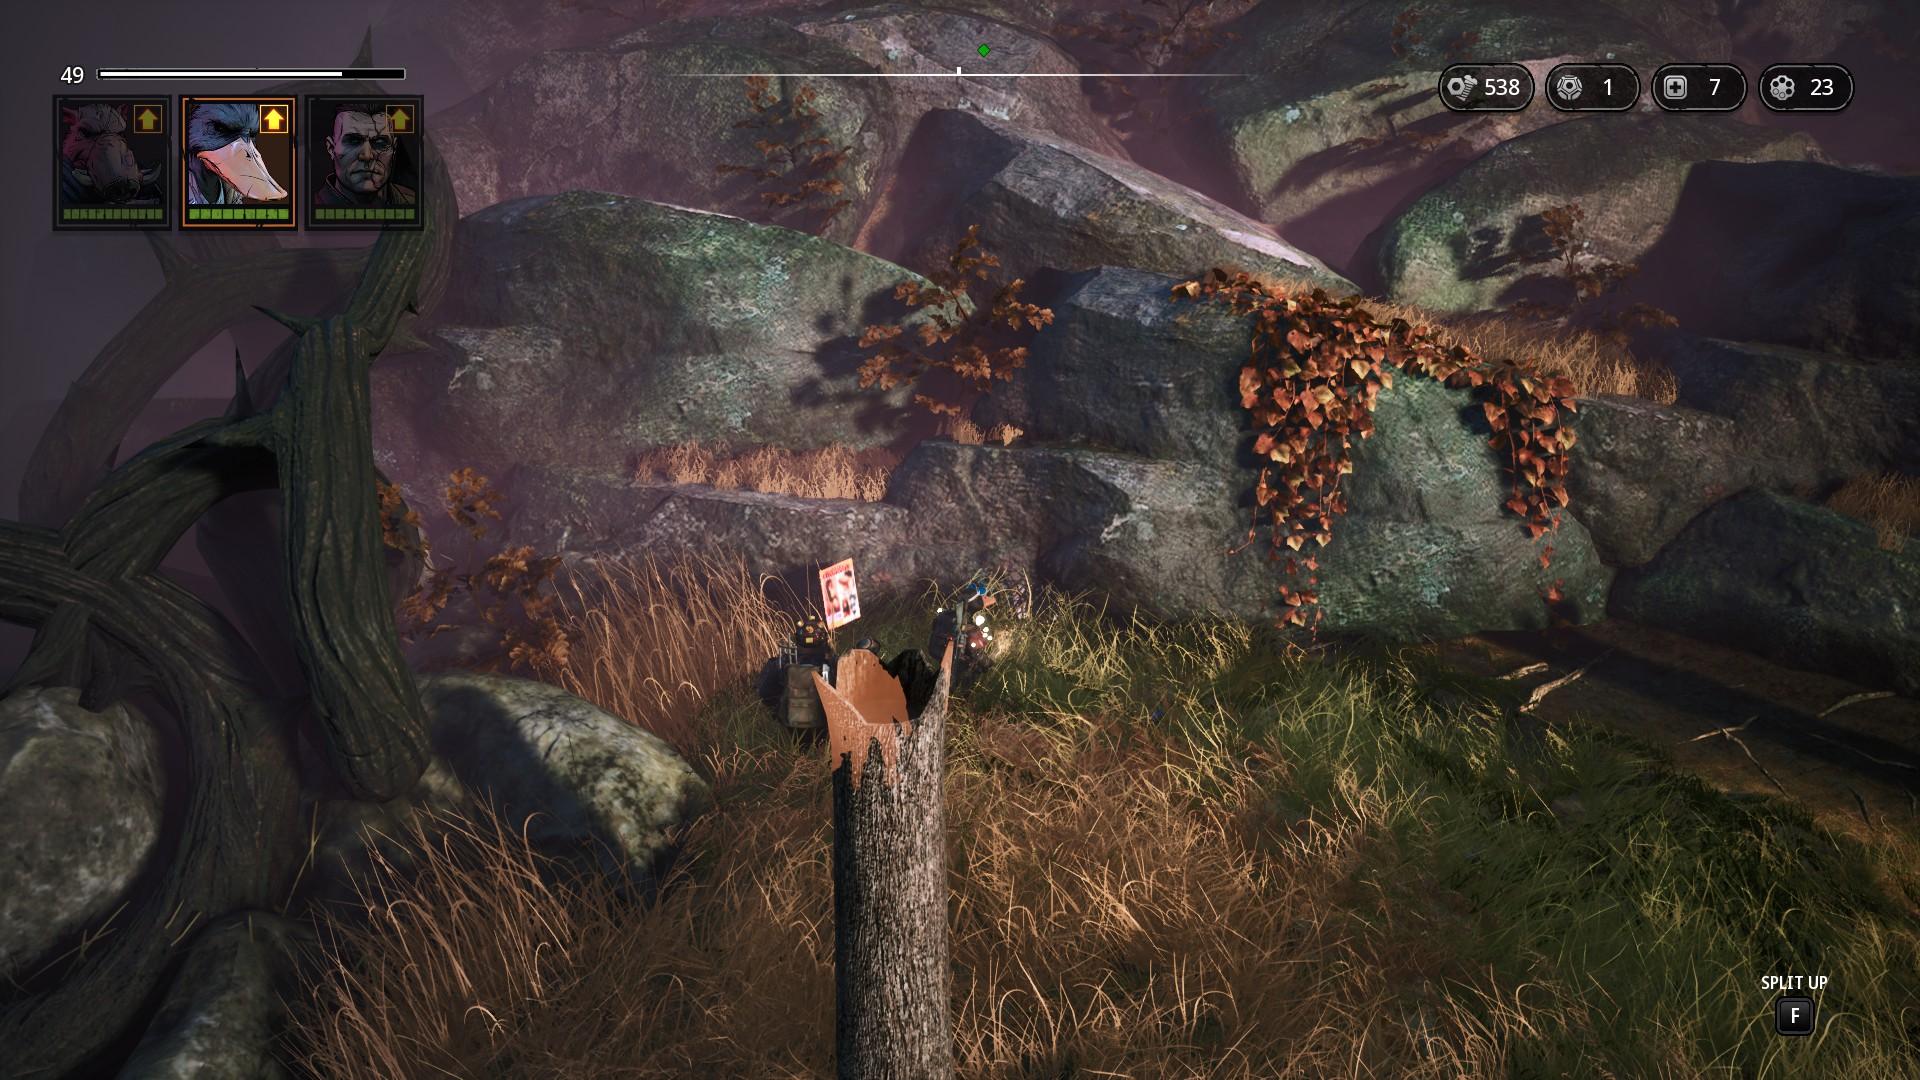 Скрытые Bushmags в Mutant Year Zero: Road to Eden